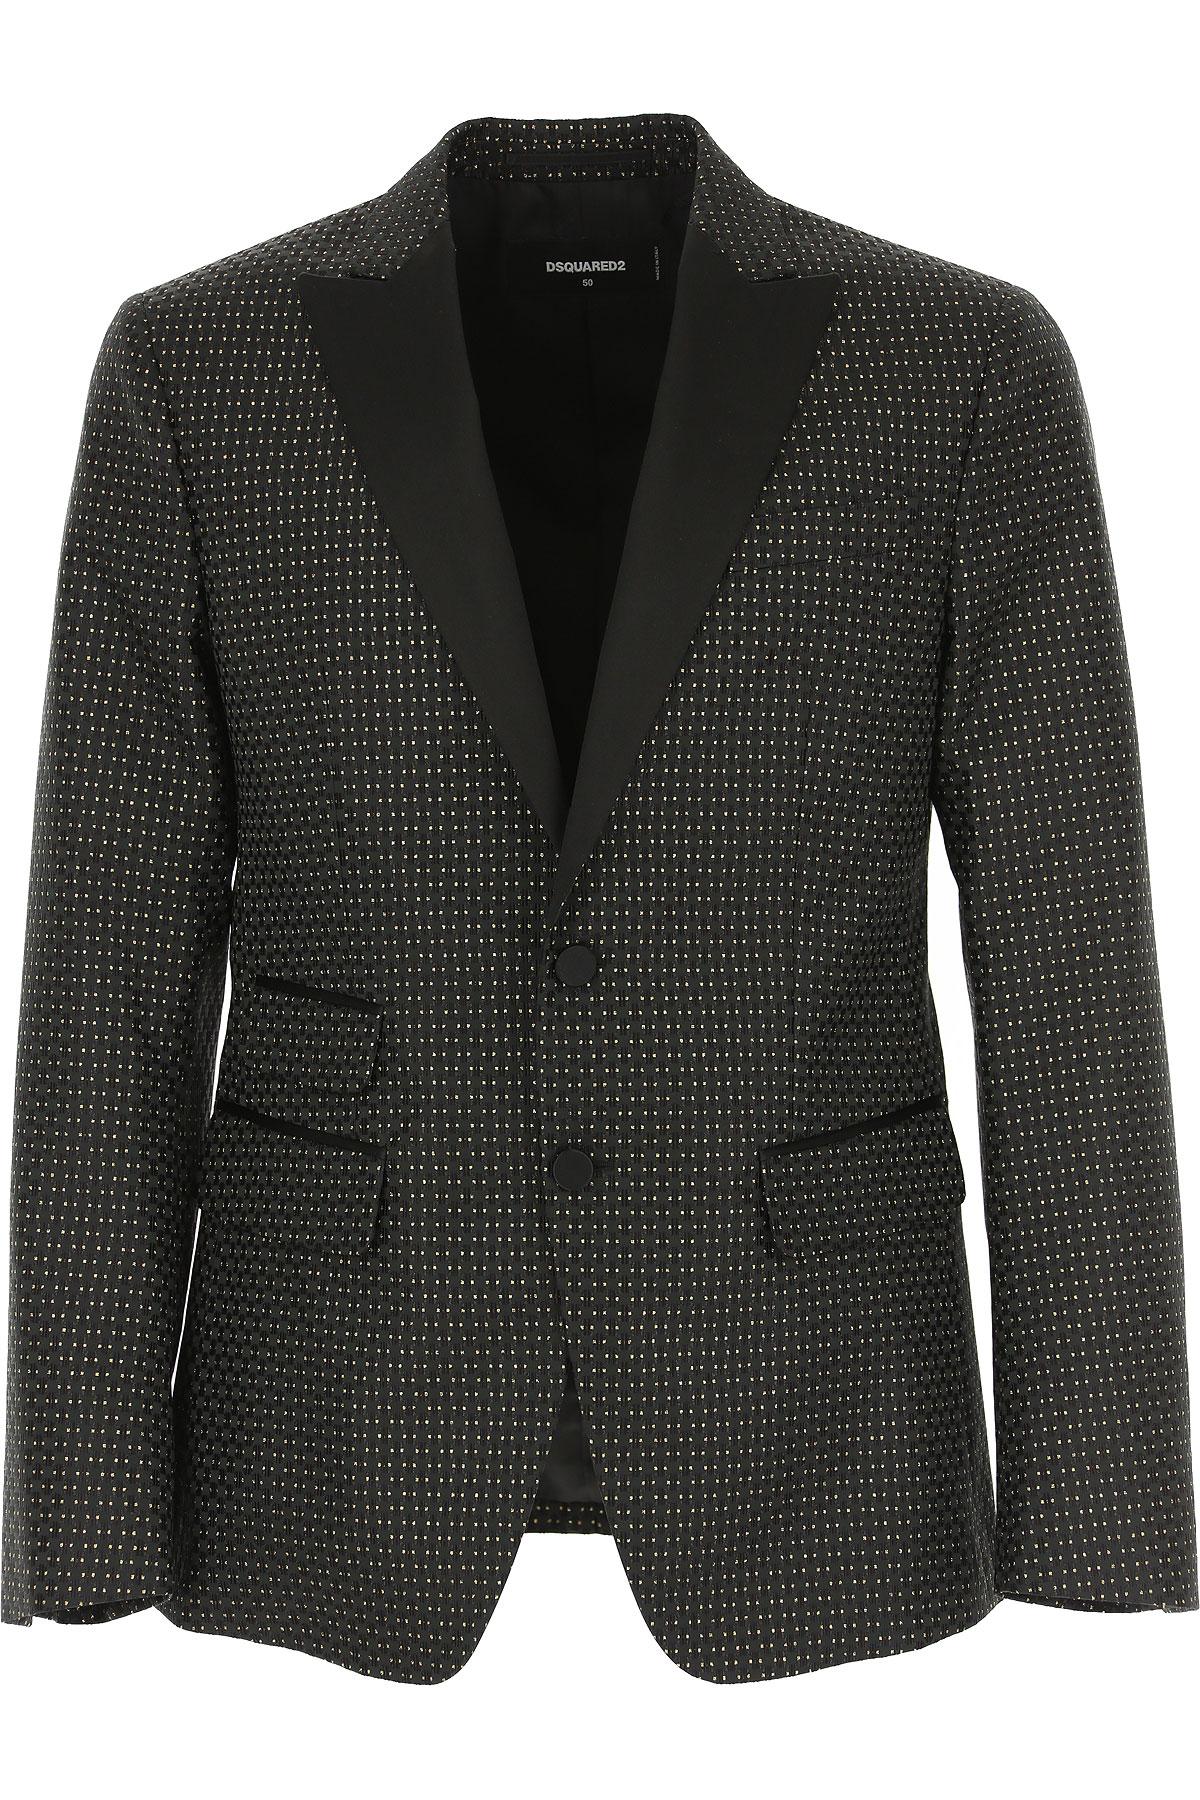 Dsquared2 Blazer for Men, Sport Coat, Black, polyester, 2019, L XL